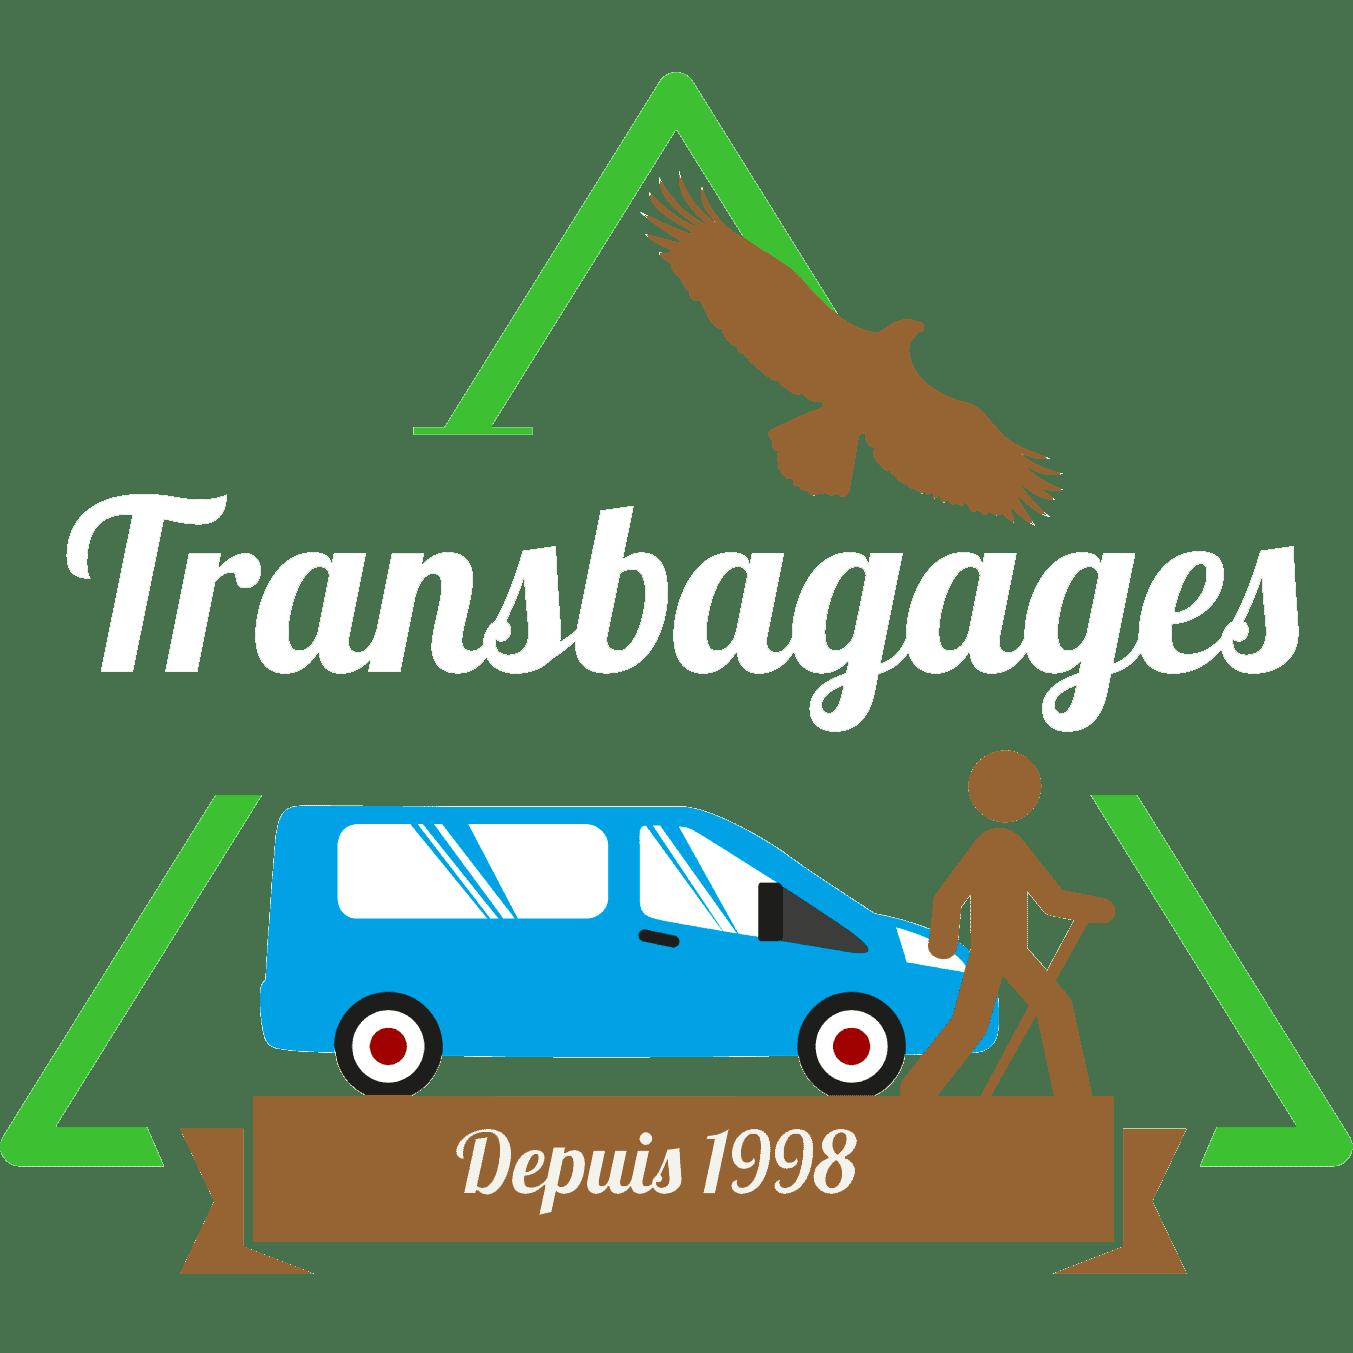 logo transbagages